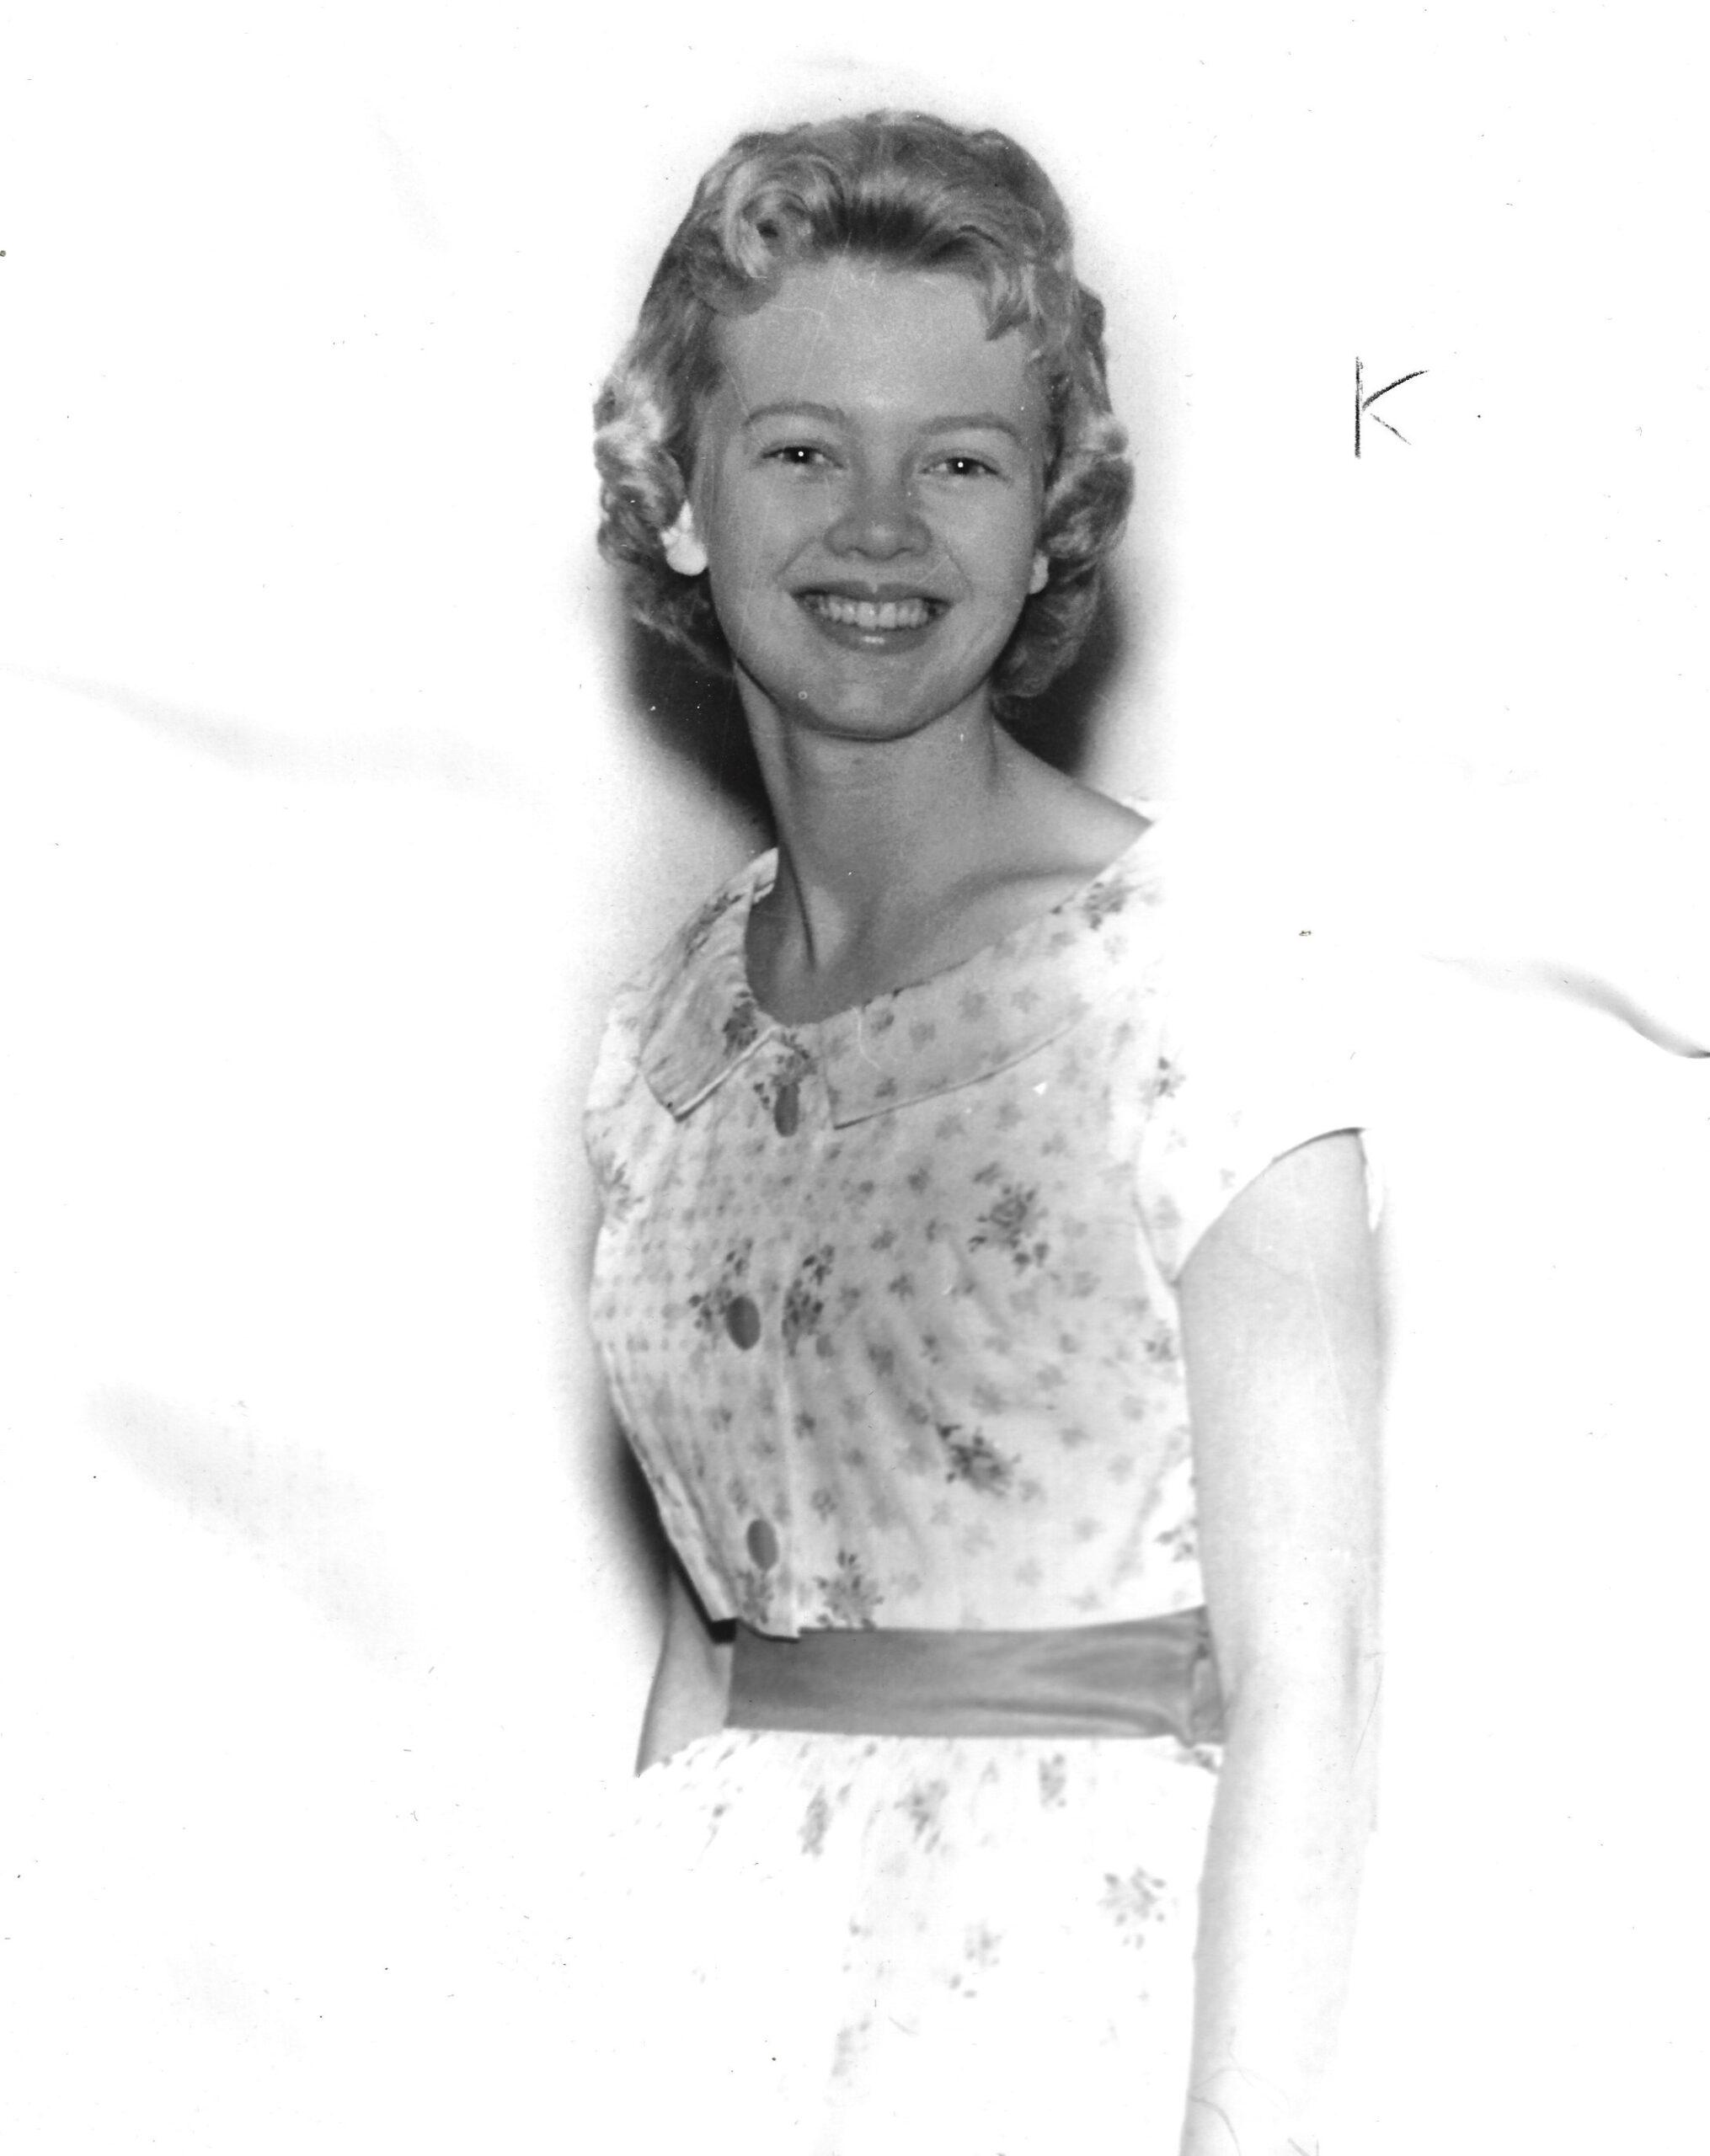 1961 Lincoln County Fair Queen